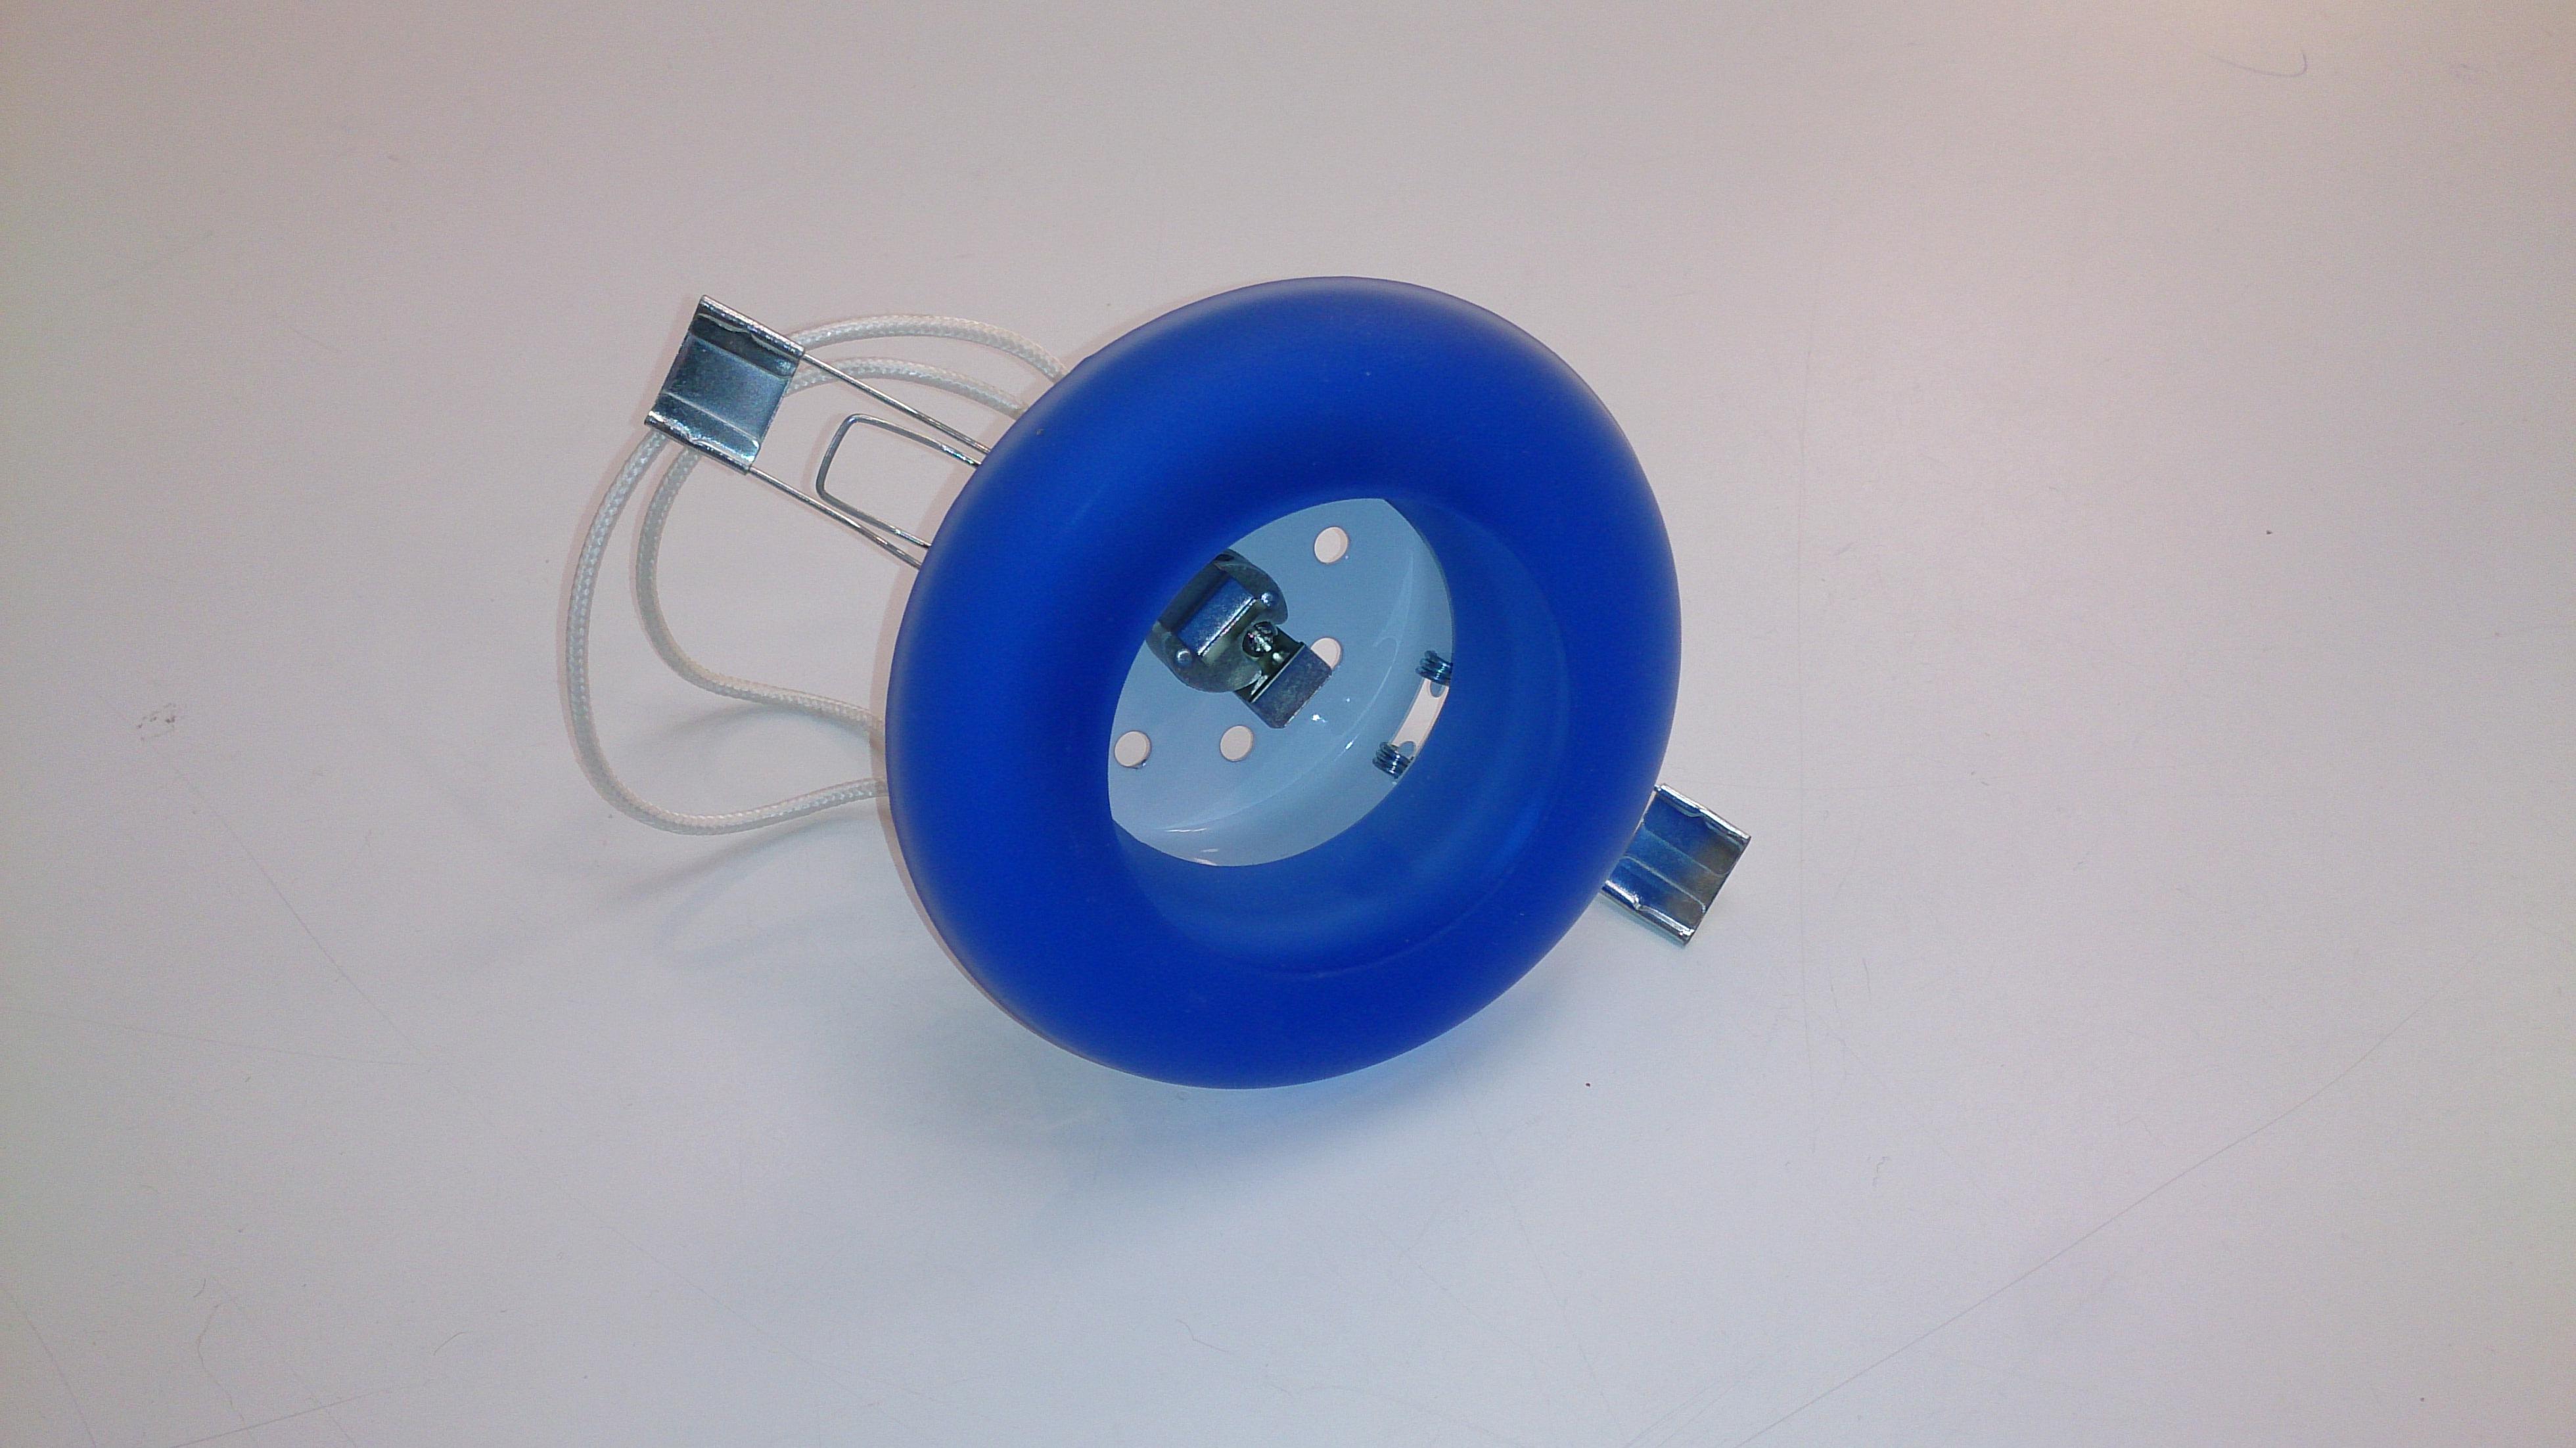 Kristall 50W G5,3 sinine  lm98mm (ava min 69... juhendis 82mm)